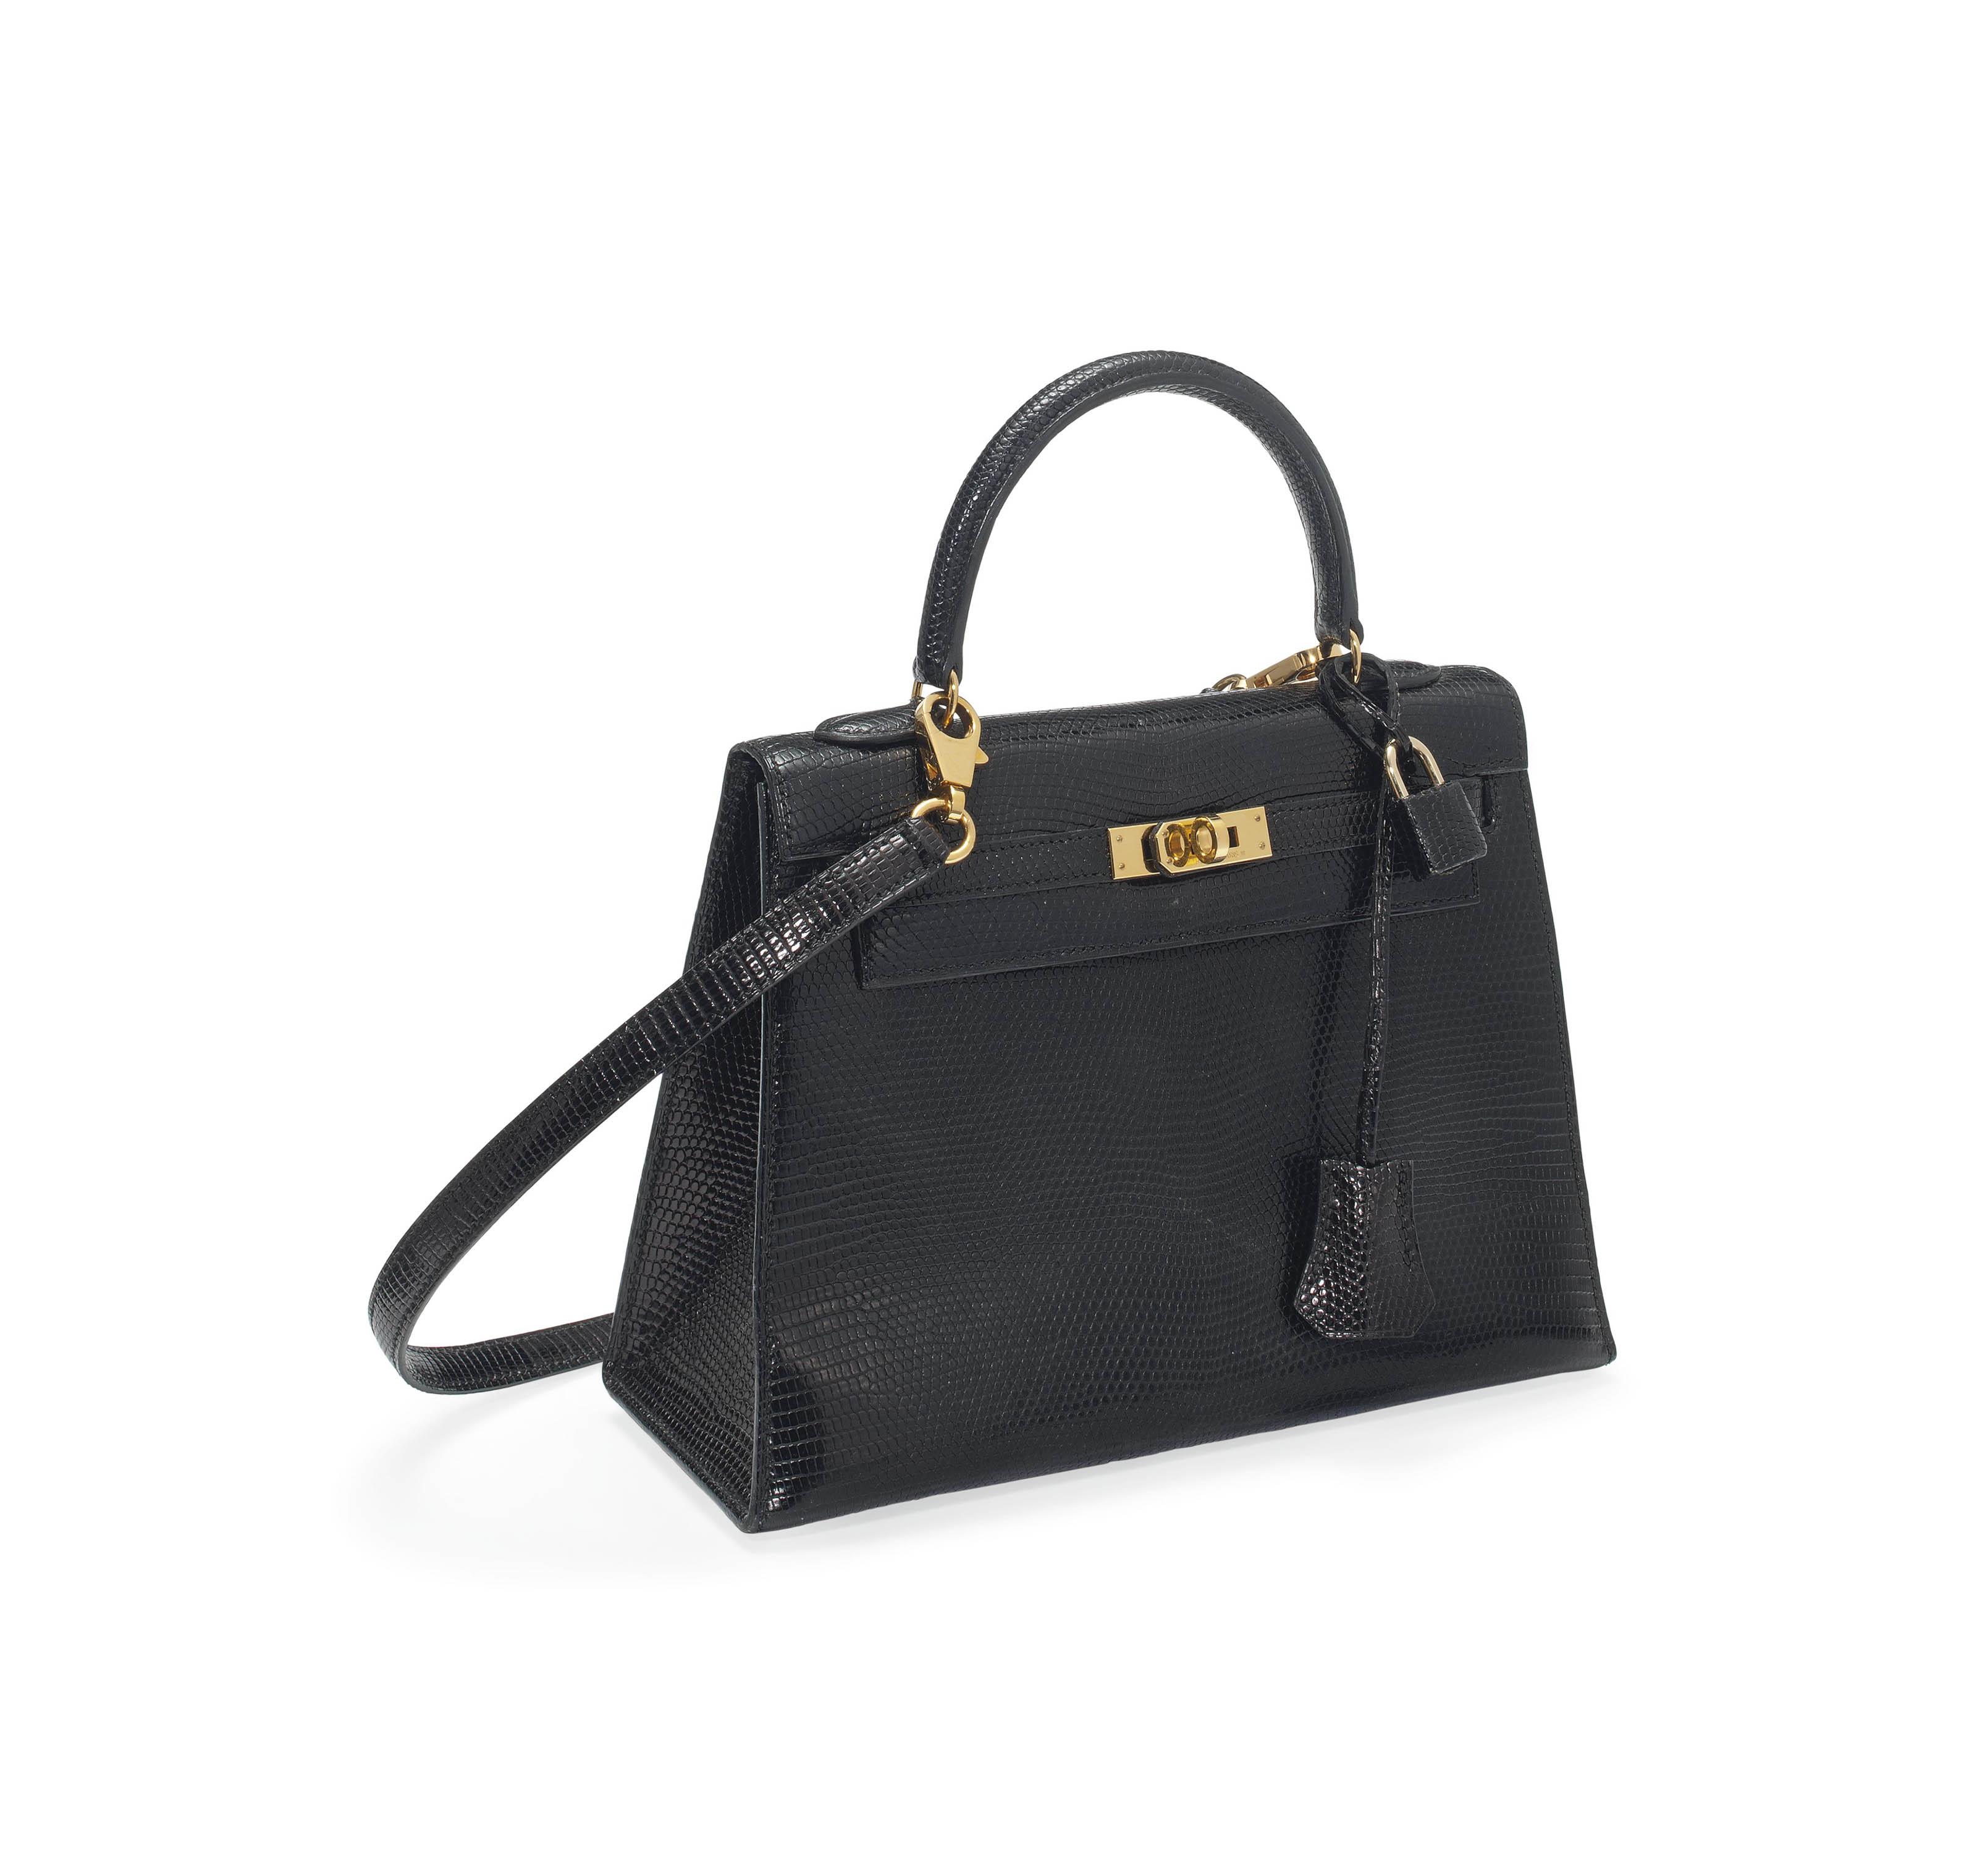 A BLACK LIZARD 'KELLY' BAG